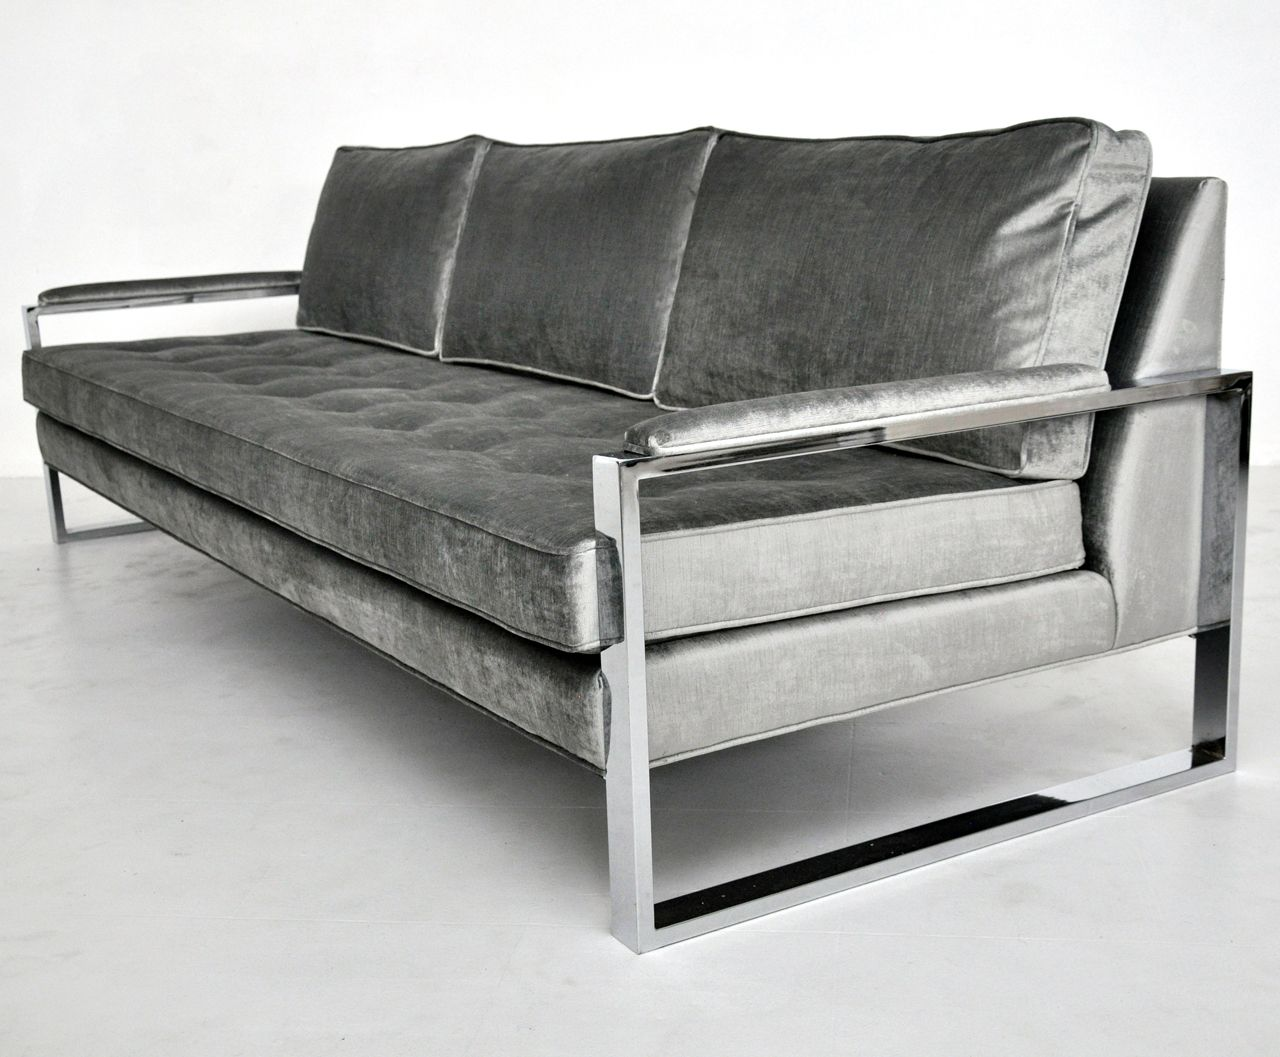 Sofa Steel Frame Steel Sofa Frames Stainless Leather Metal ...